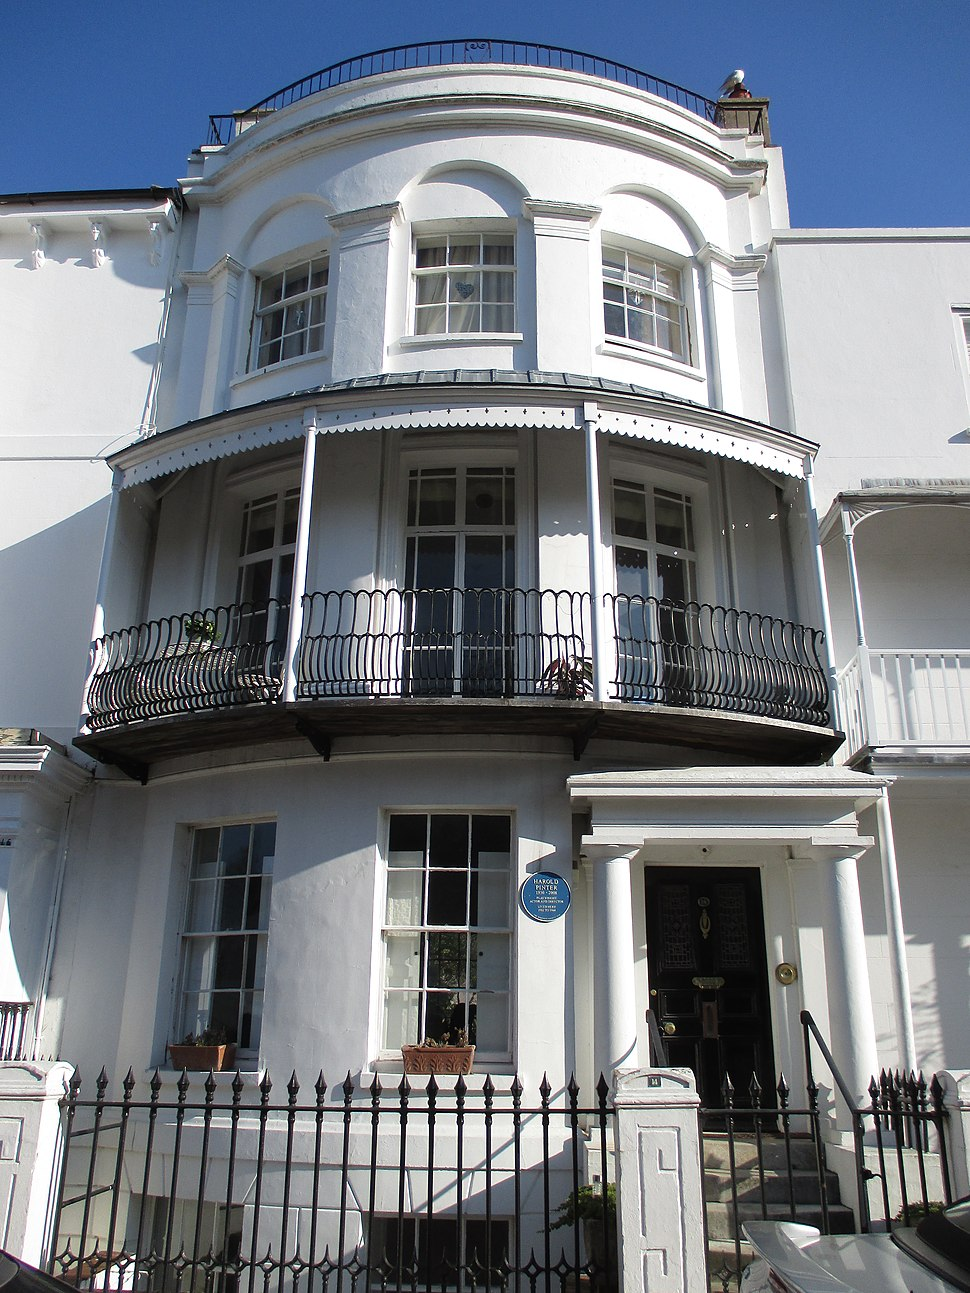 Harold Pinter's home, Worthing